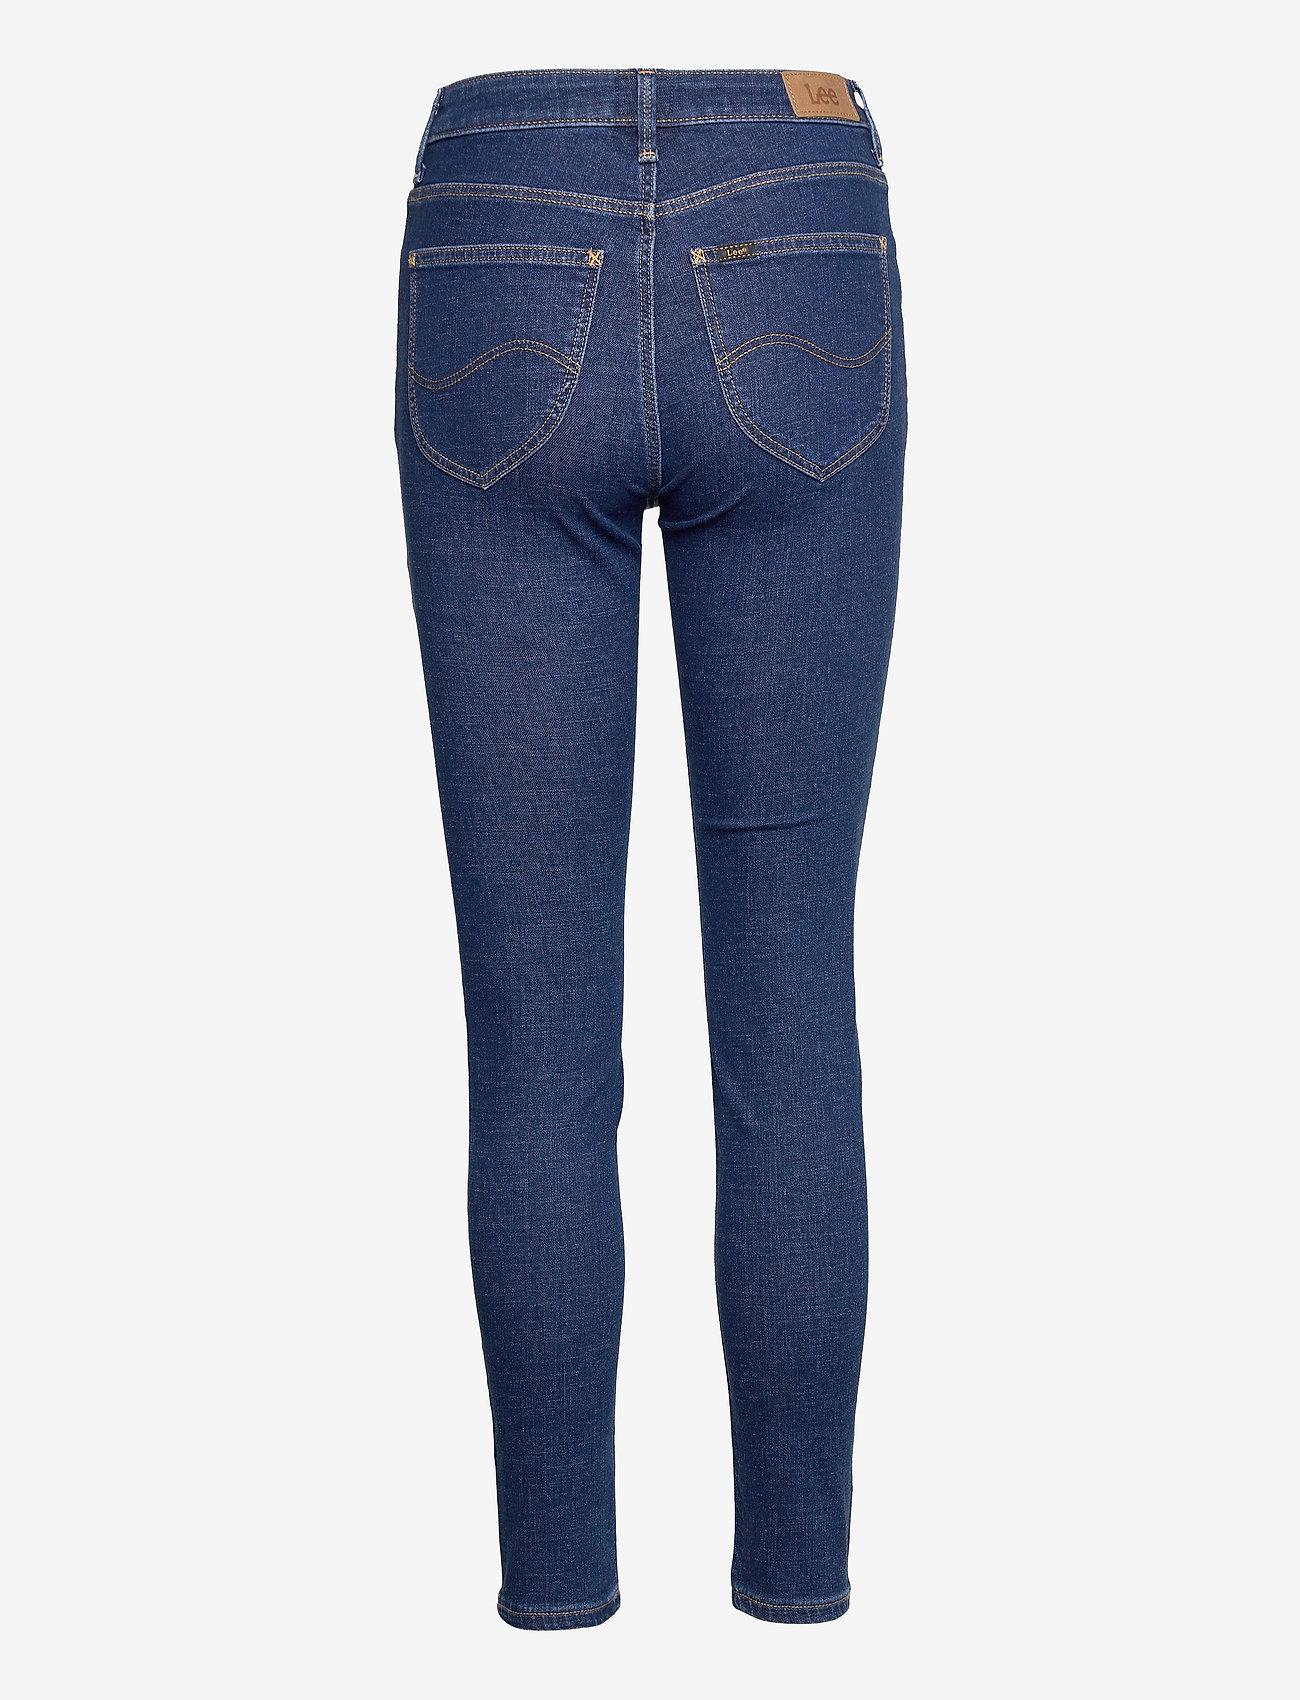 Lee Jeans - SCARLETT HIGH - skinny jeans - dark mono - 1